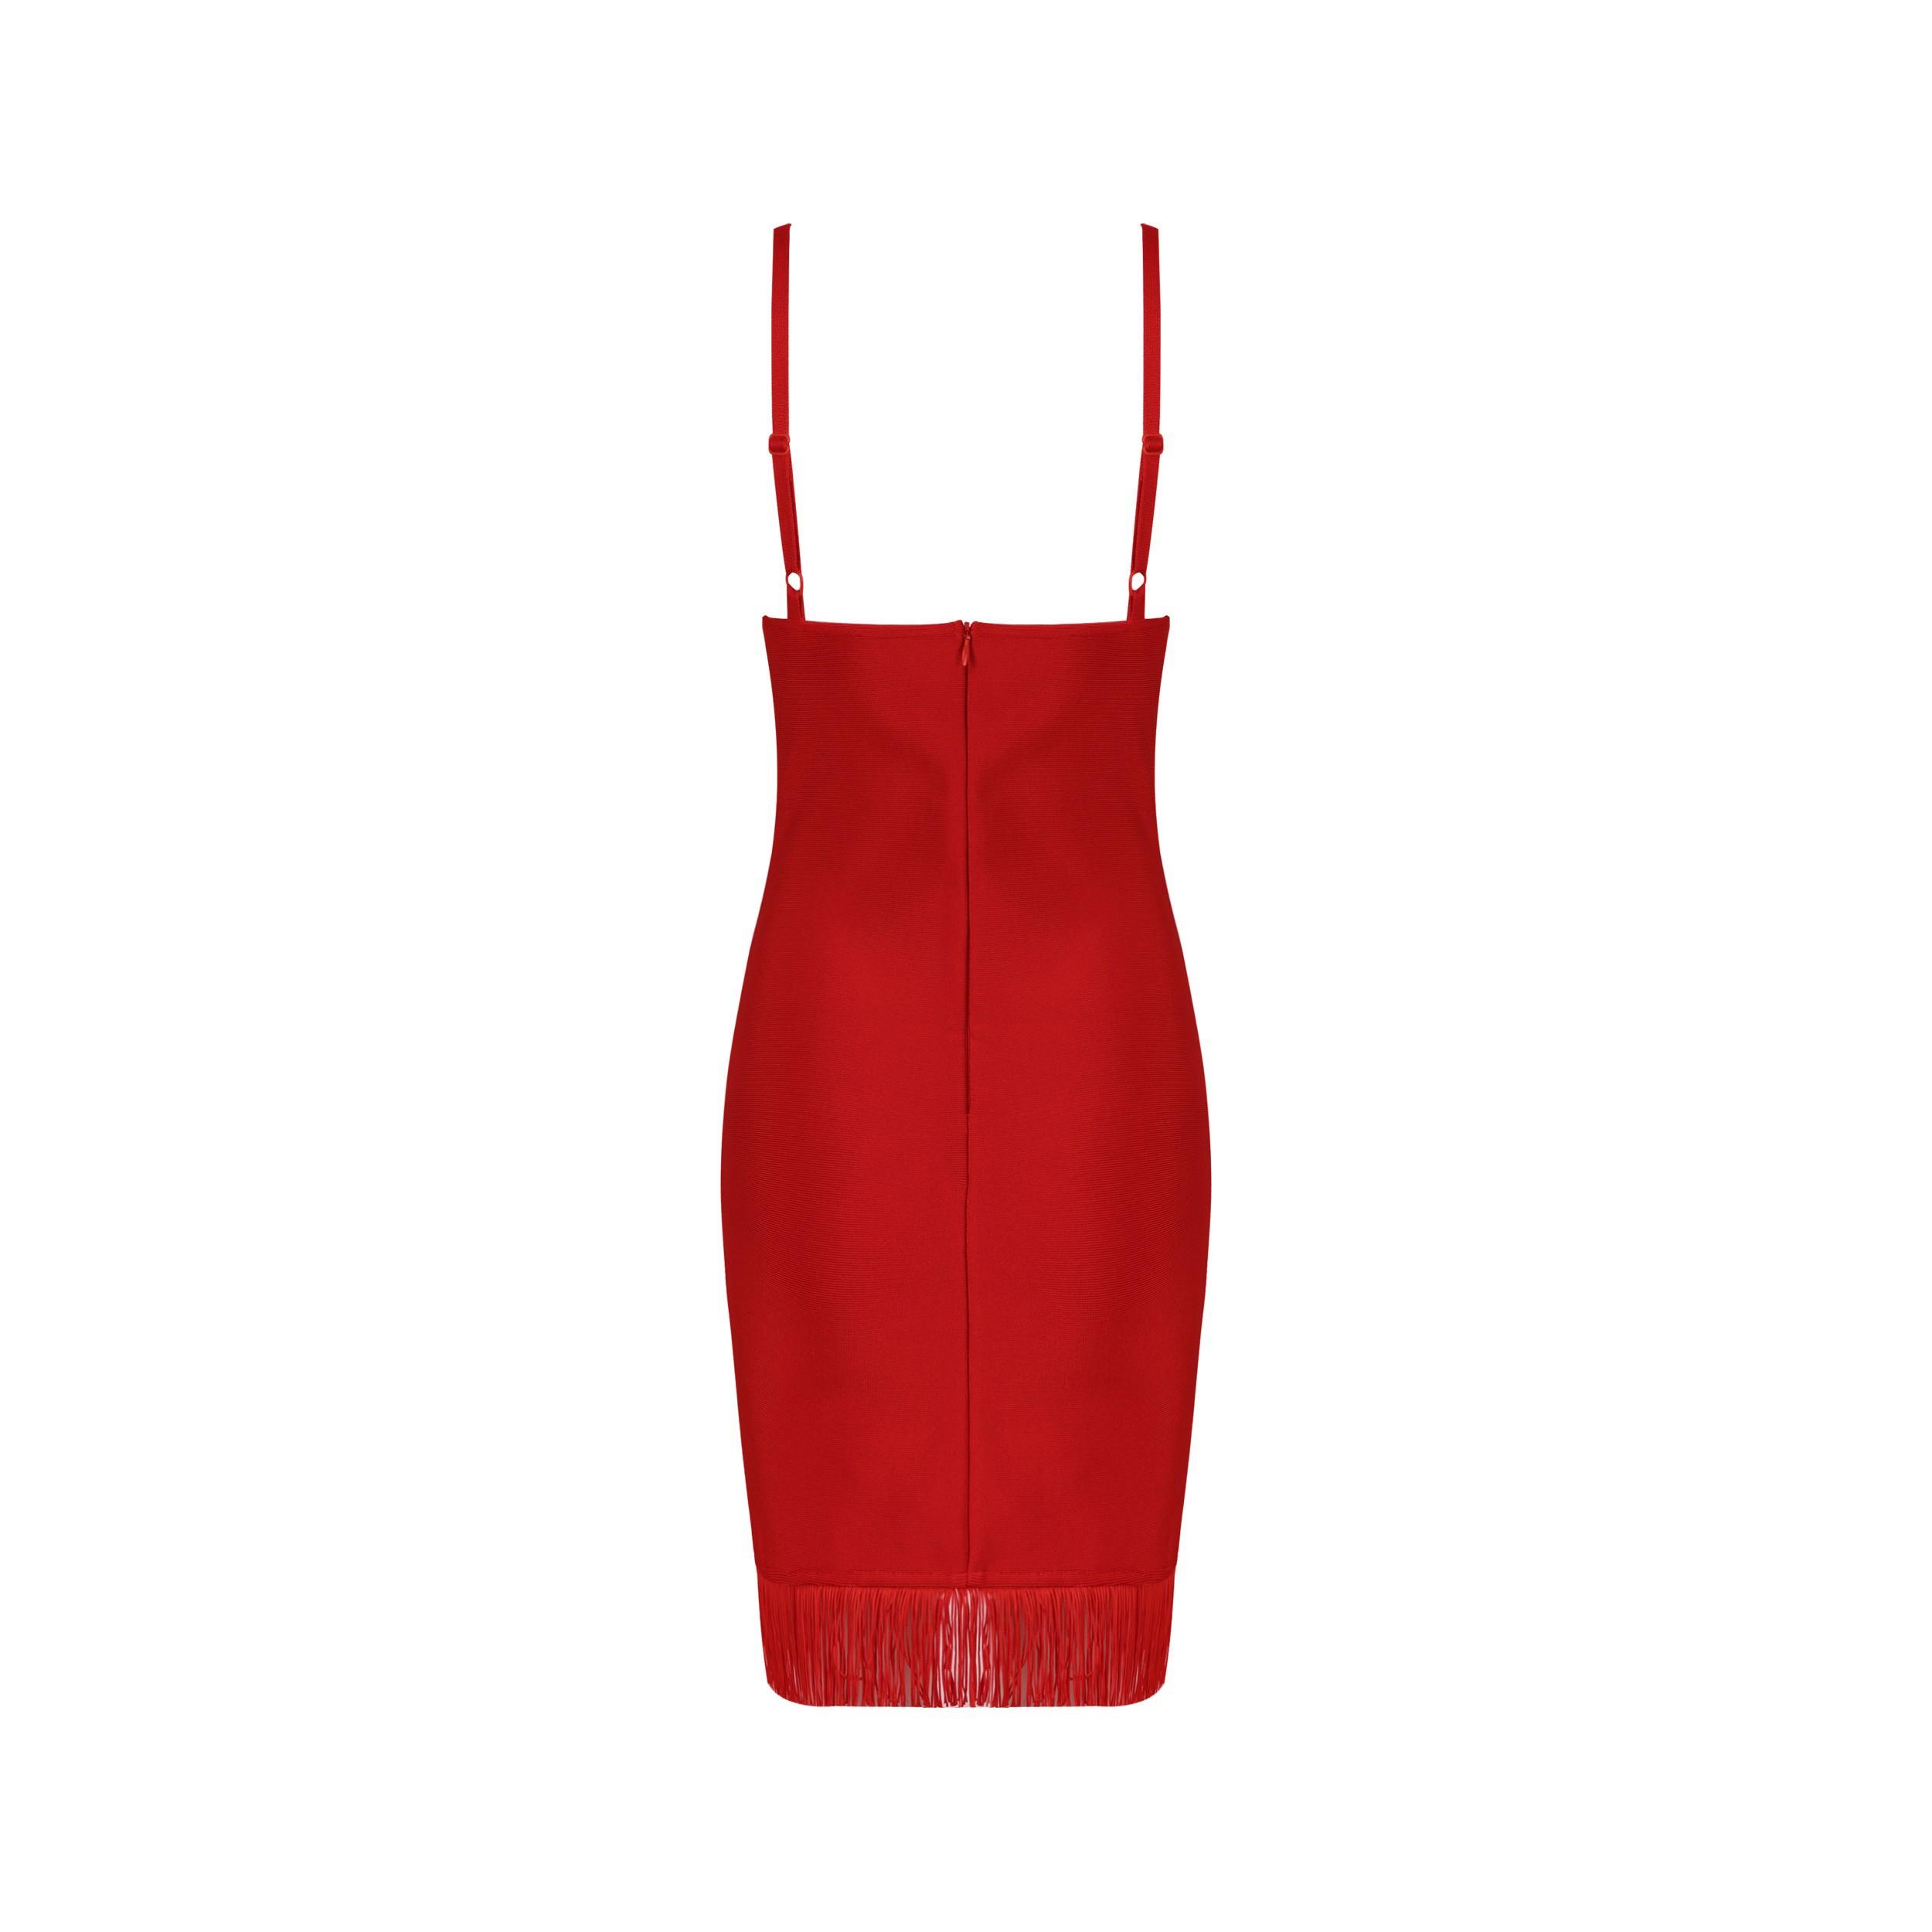 Red Strapy Sleeveless Mini Tisseled Front V Neck Hot Bandage Dress HB4392-Red